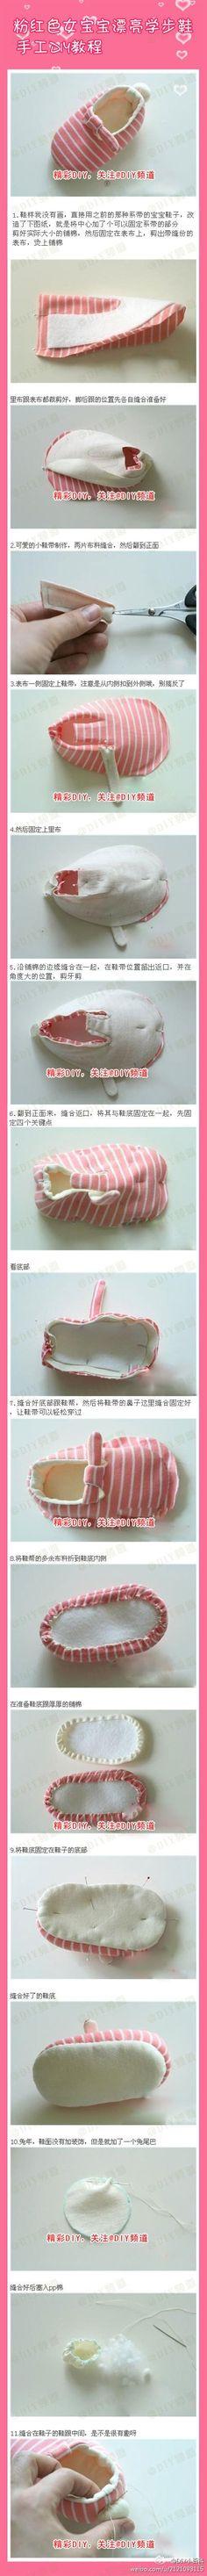 Beautiful pink female baby toddler shoes handmade diy tutorial